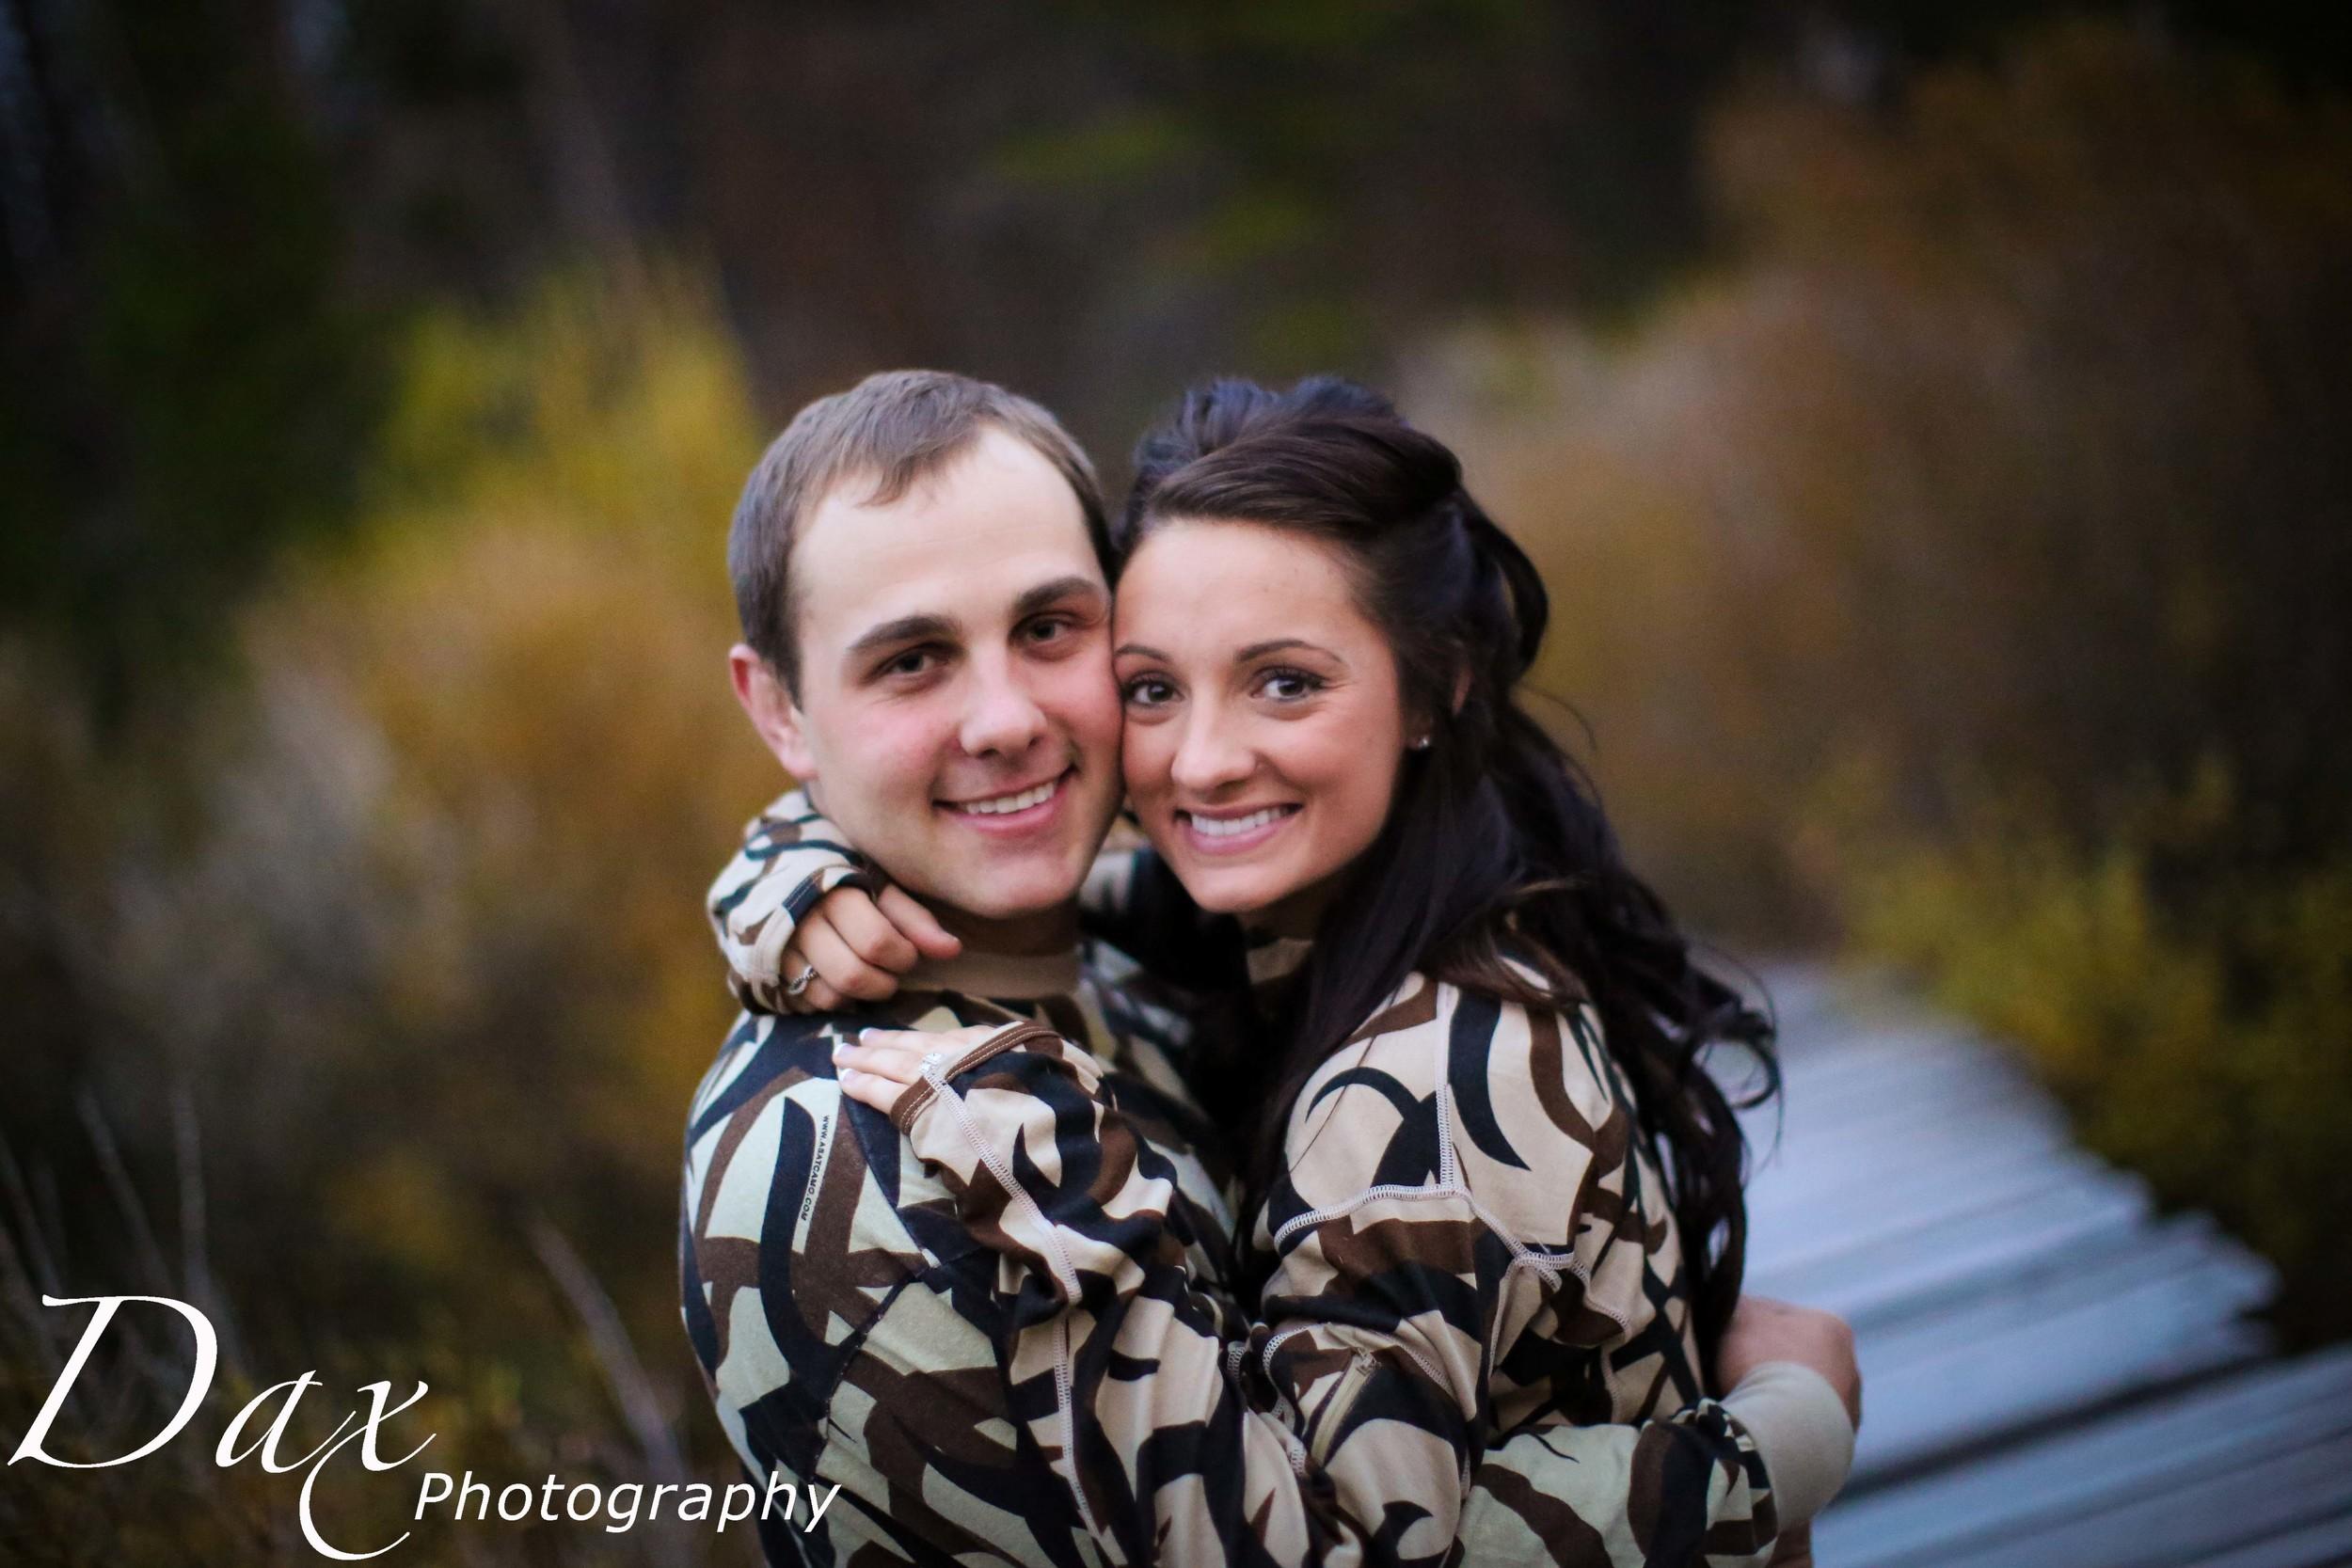 wpid-Montana-photographer-Engagement-Portrait-56711.jpg